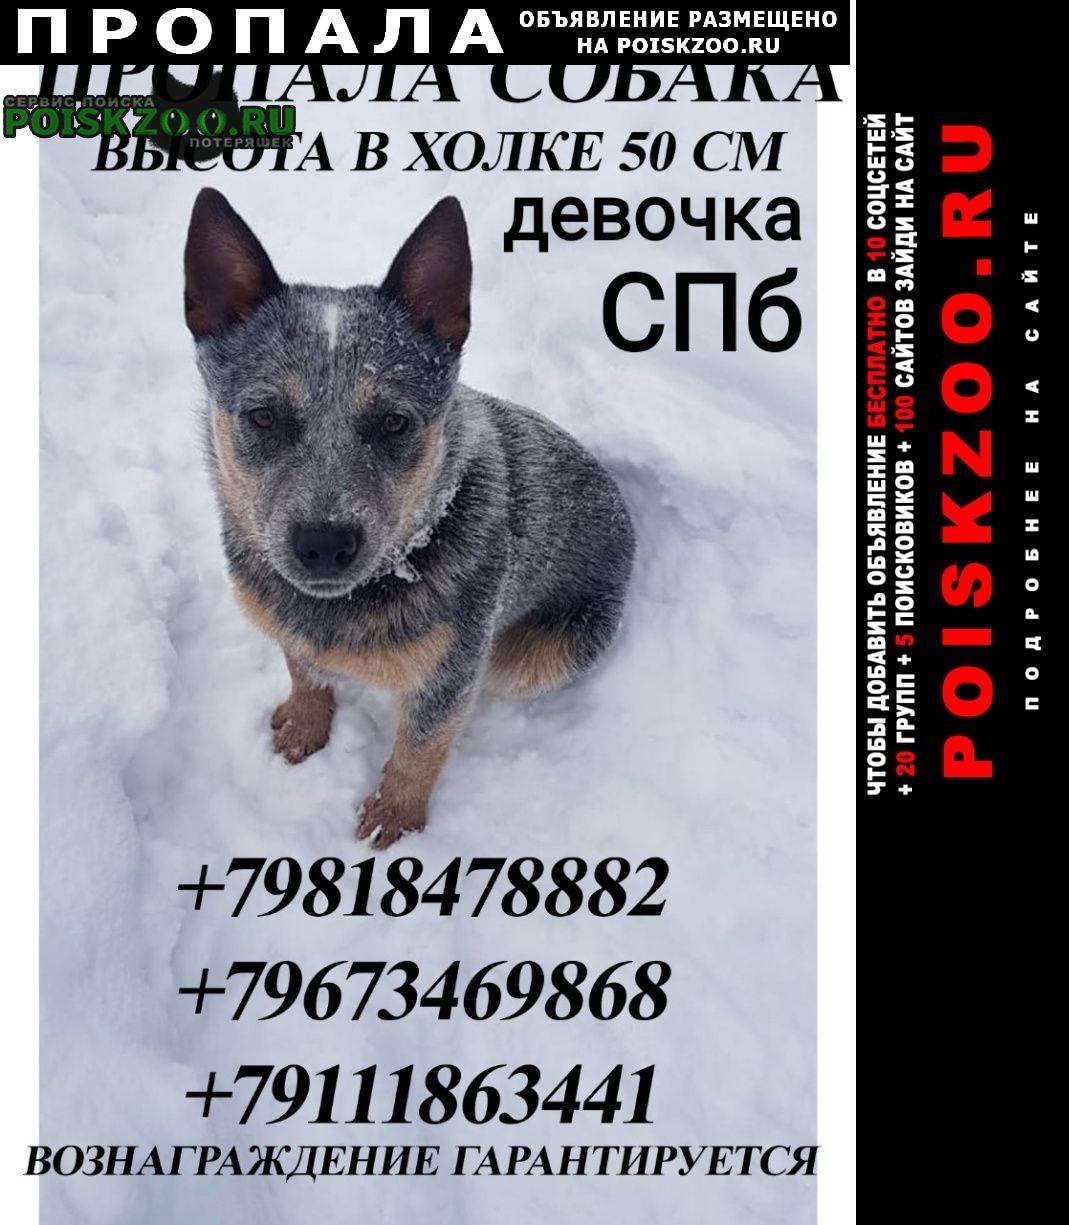 Пропала собака поиски продолжаются Санкт-Петербург